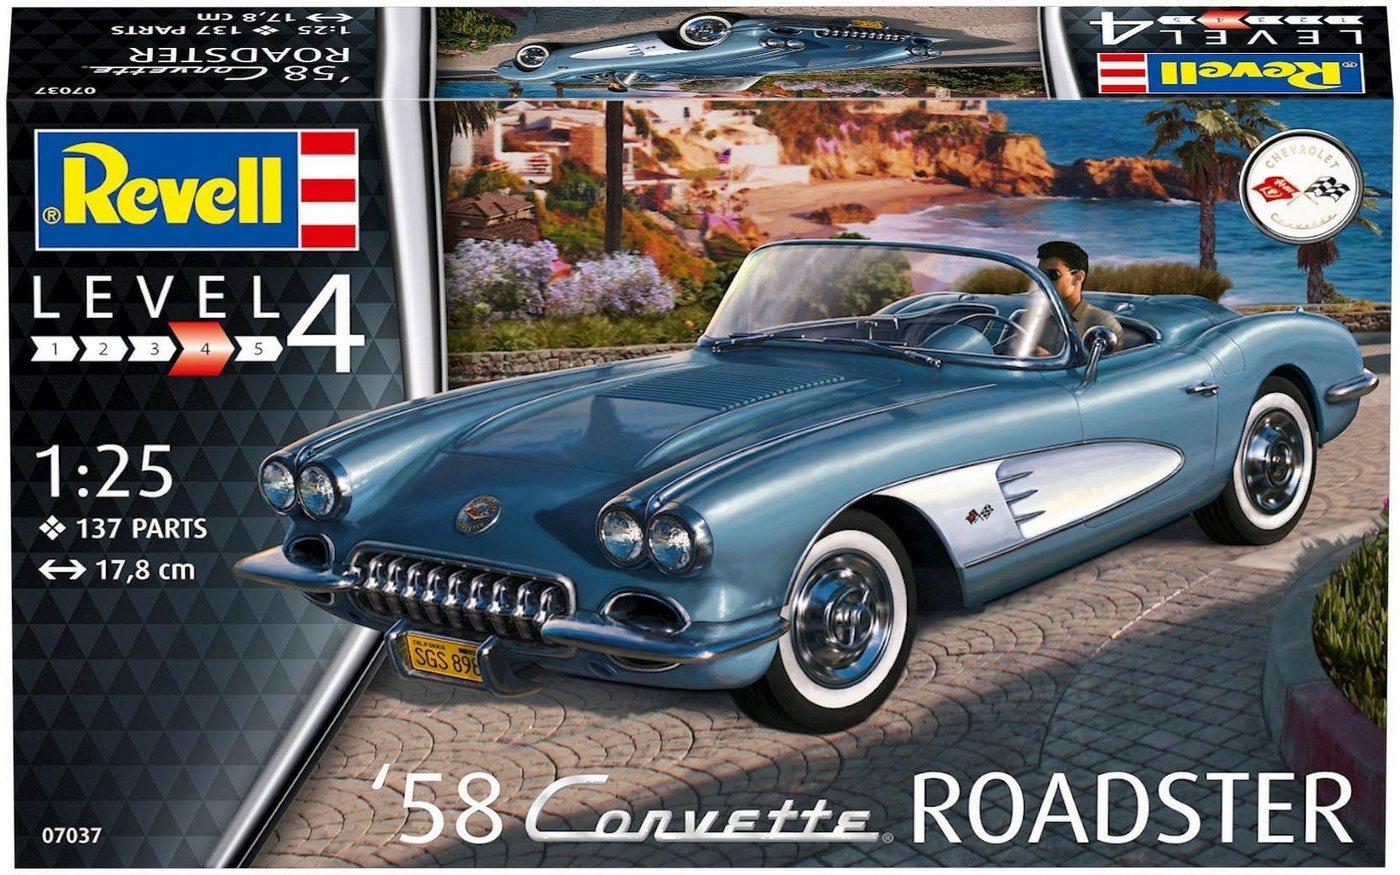 Revell Modellbausatz Auto mit Zubehör Maßstab 1:25, »Model Set ´58 Corvette Roadster«